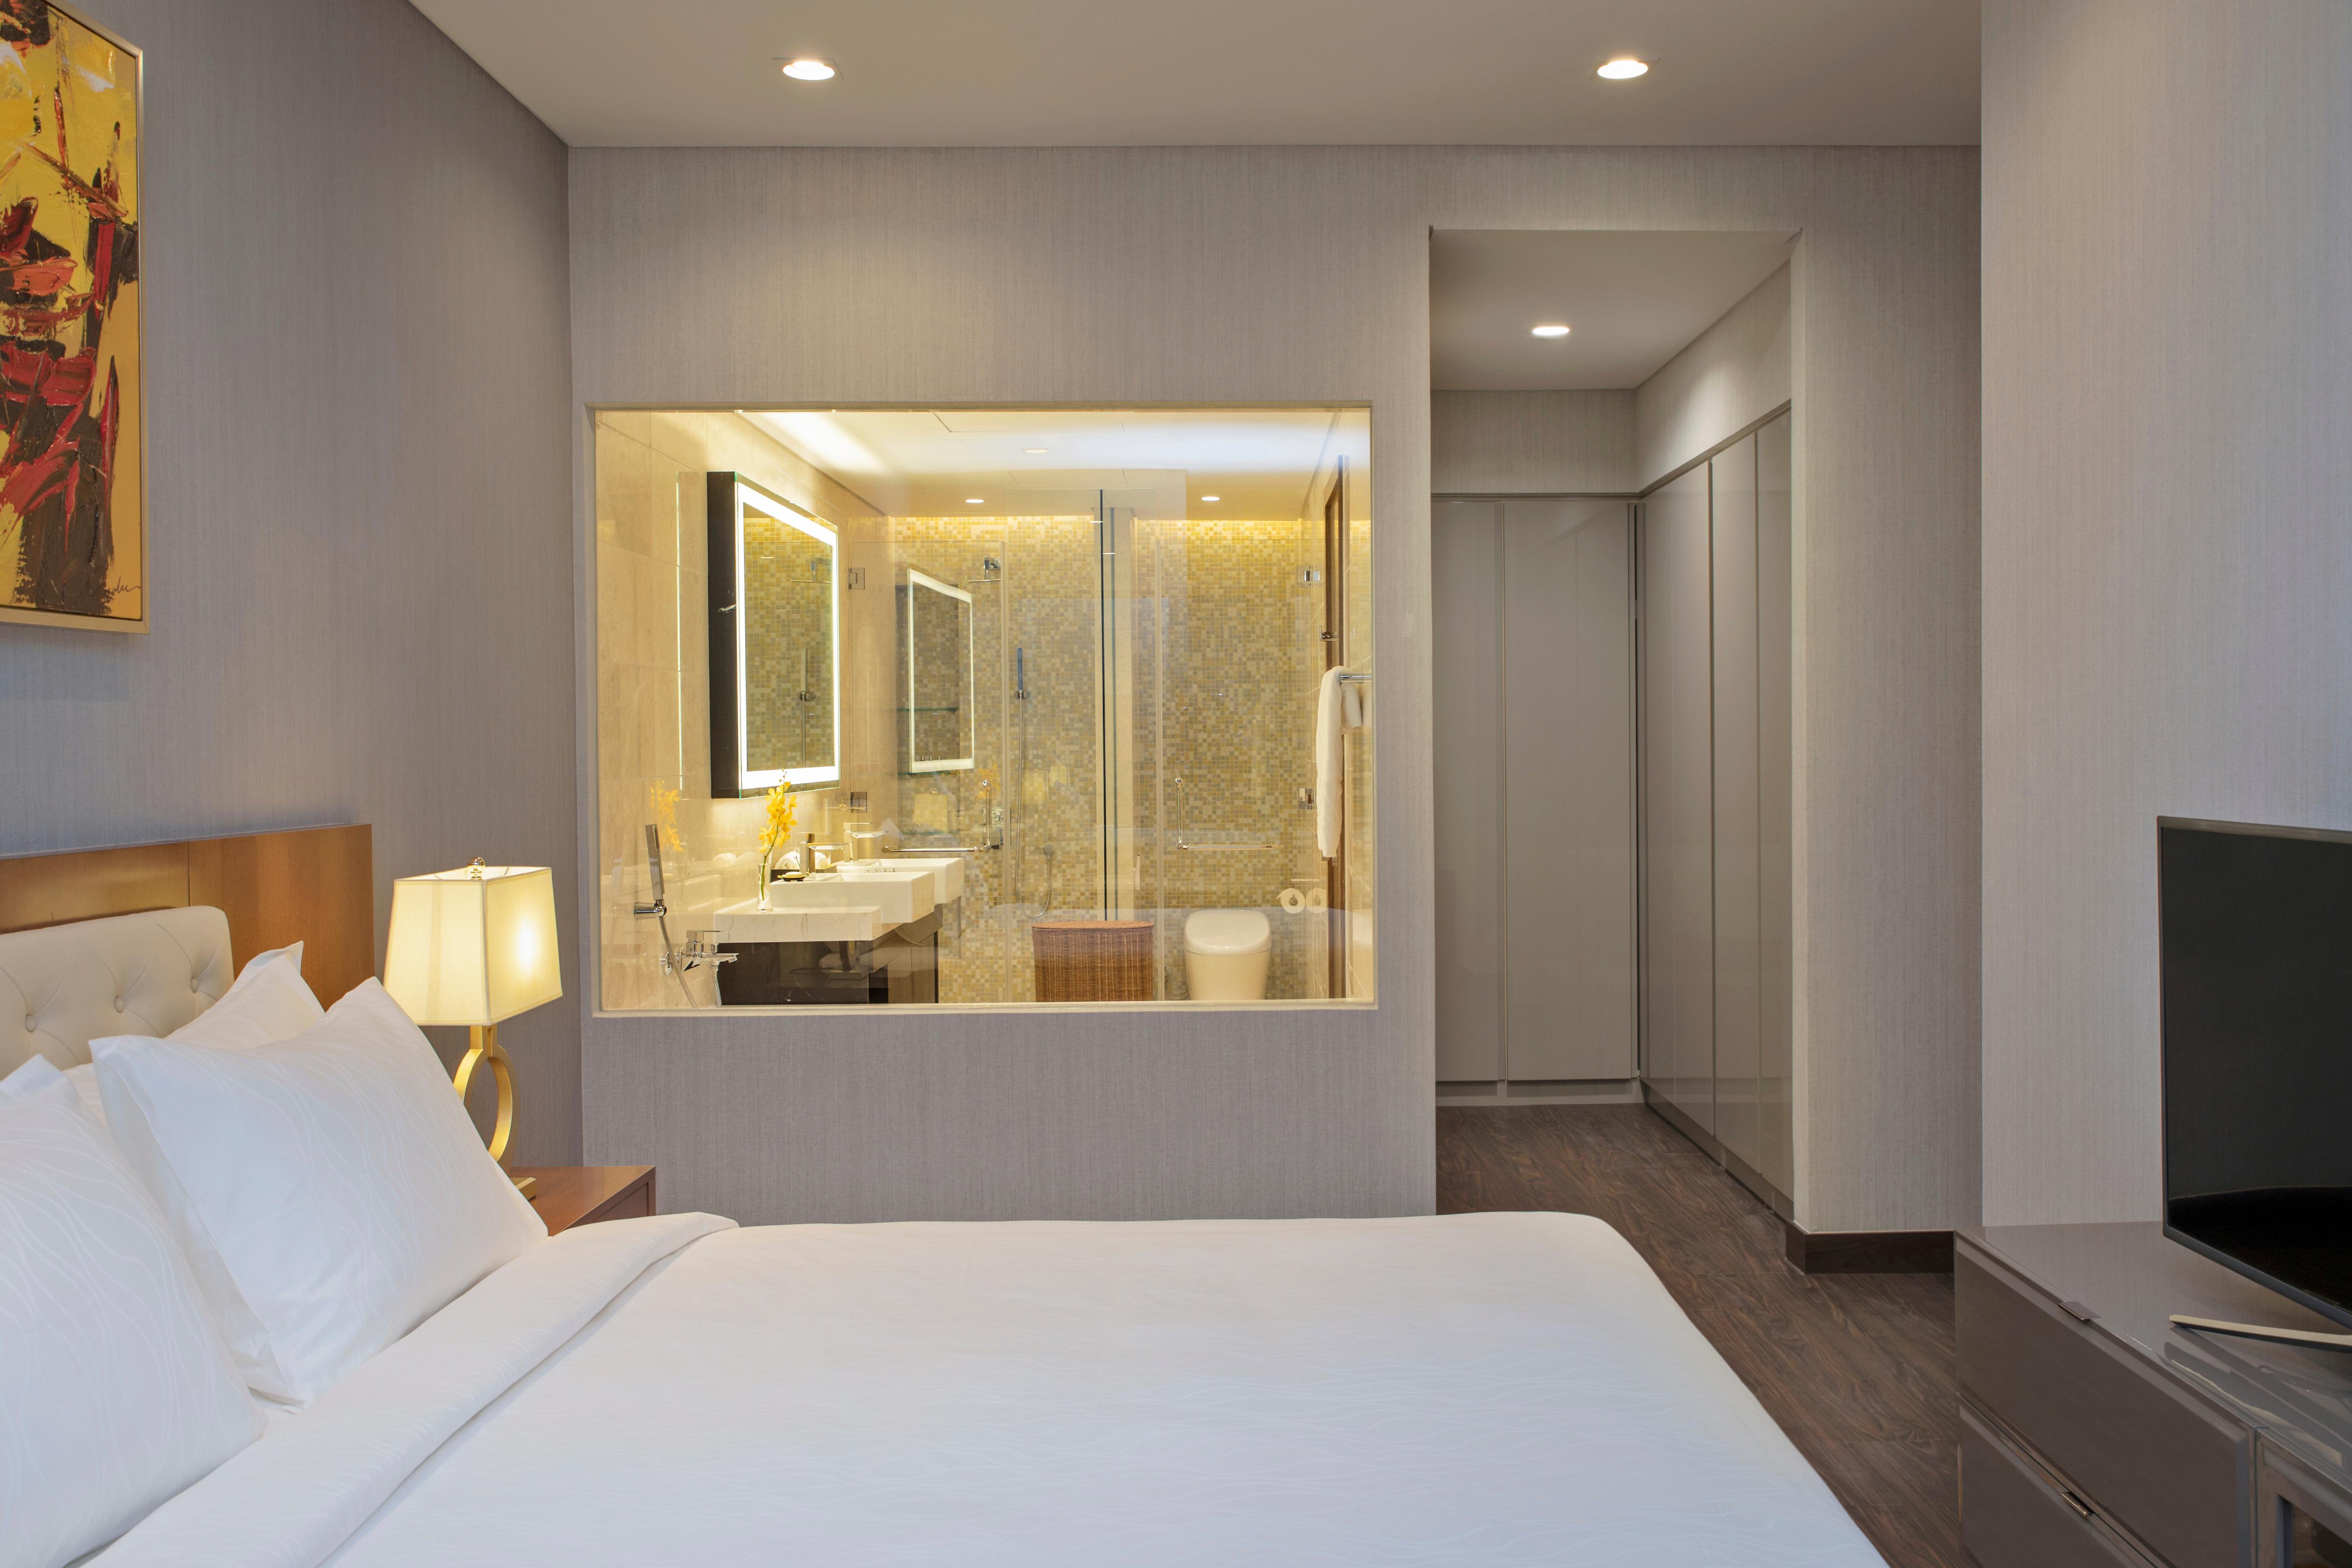 SSHCMCGT_-Grand-Two-Bedroom-Master